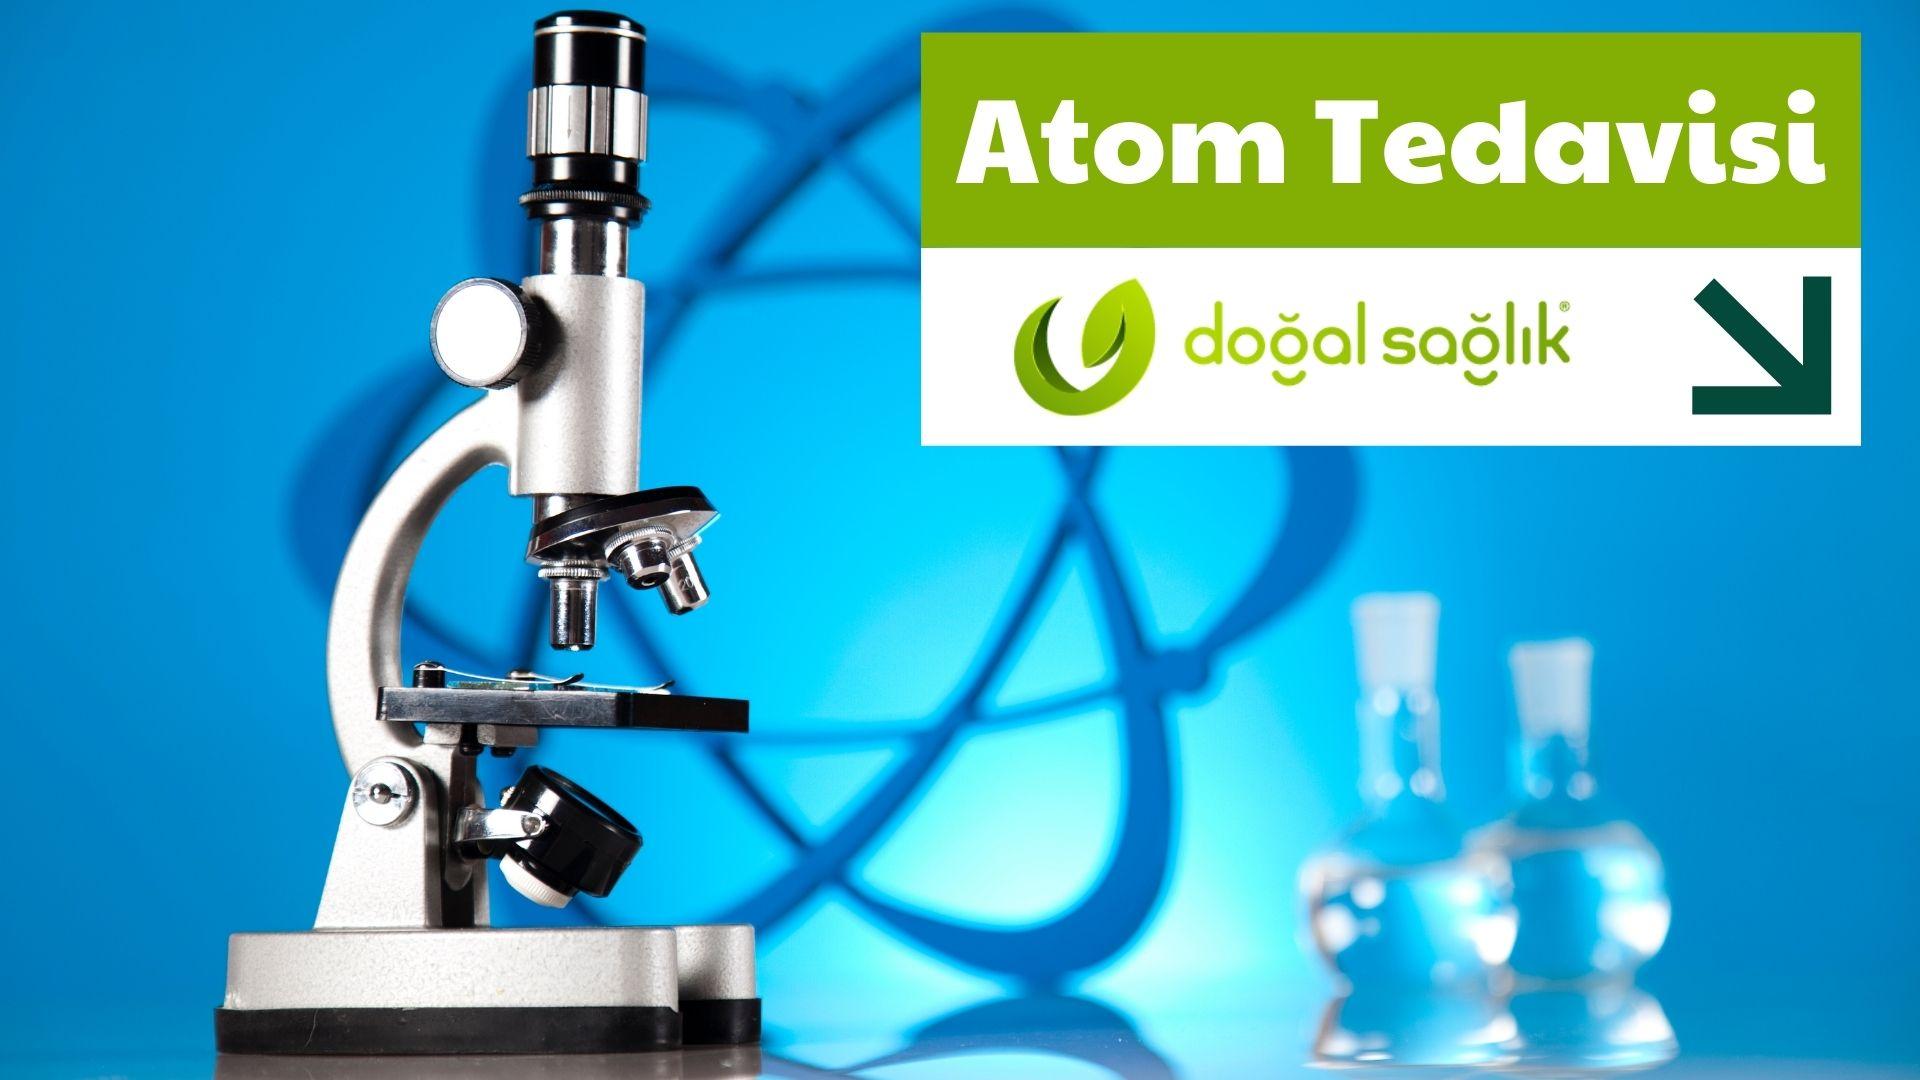 Atom Tedavisi